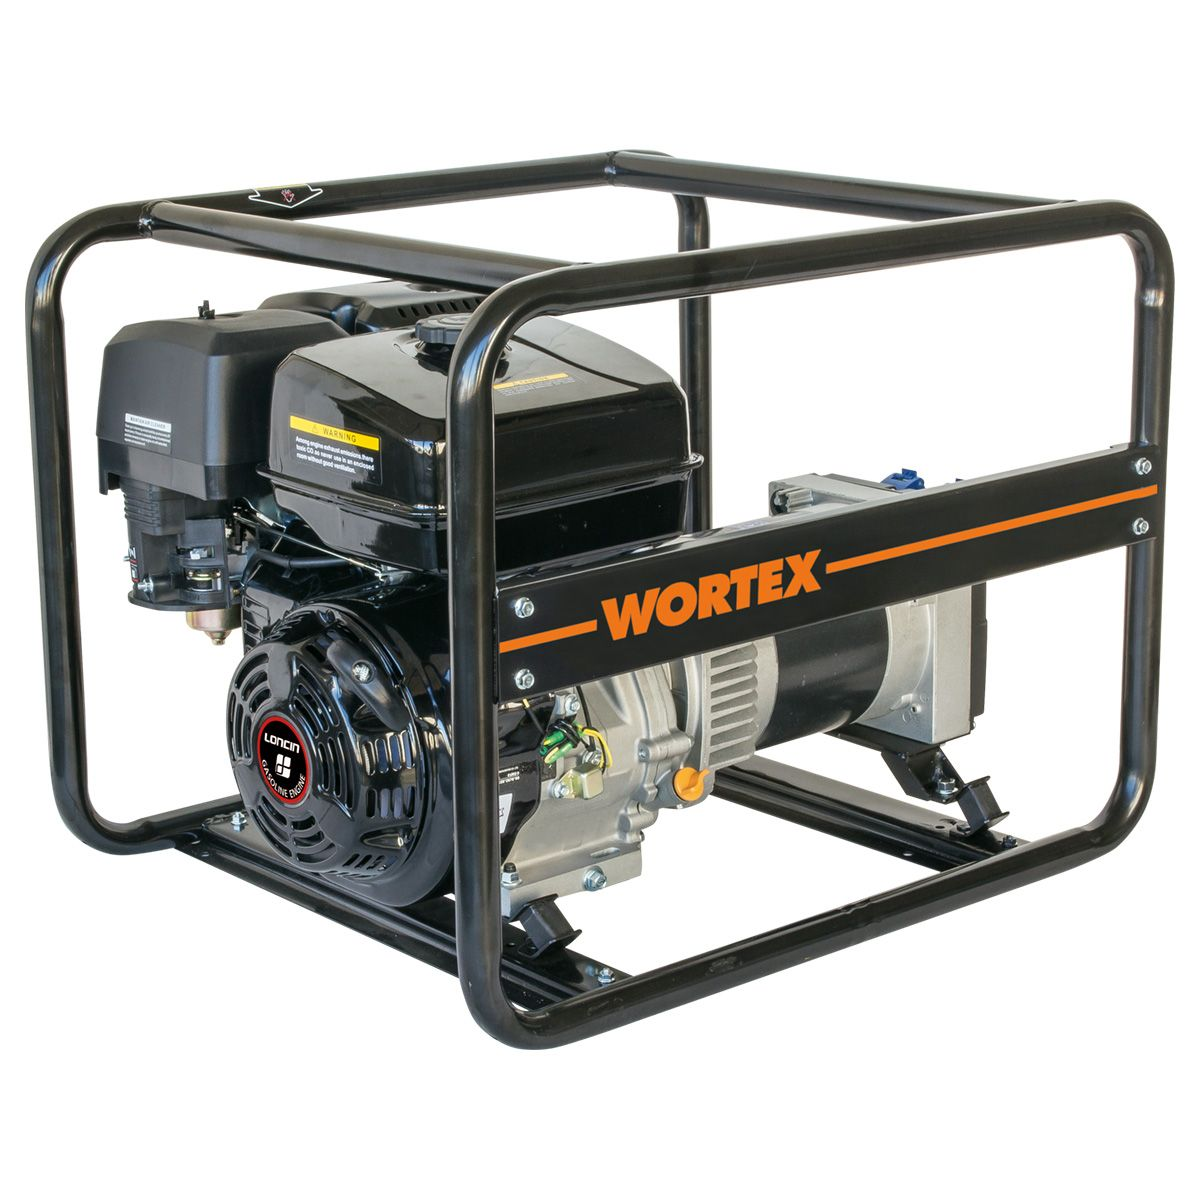 WORTEX LWS 3000 HL Generatore a Gasolio 4t